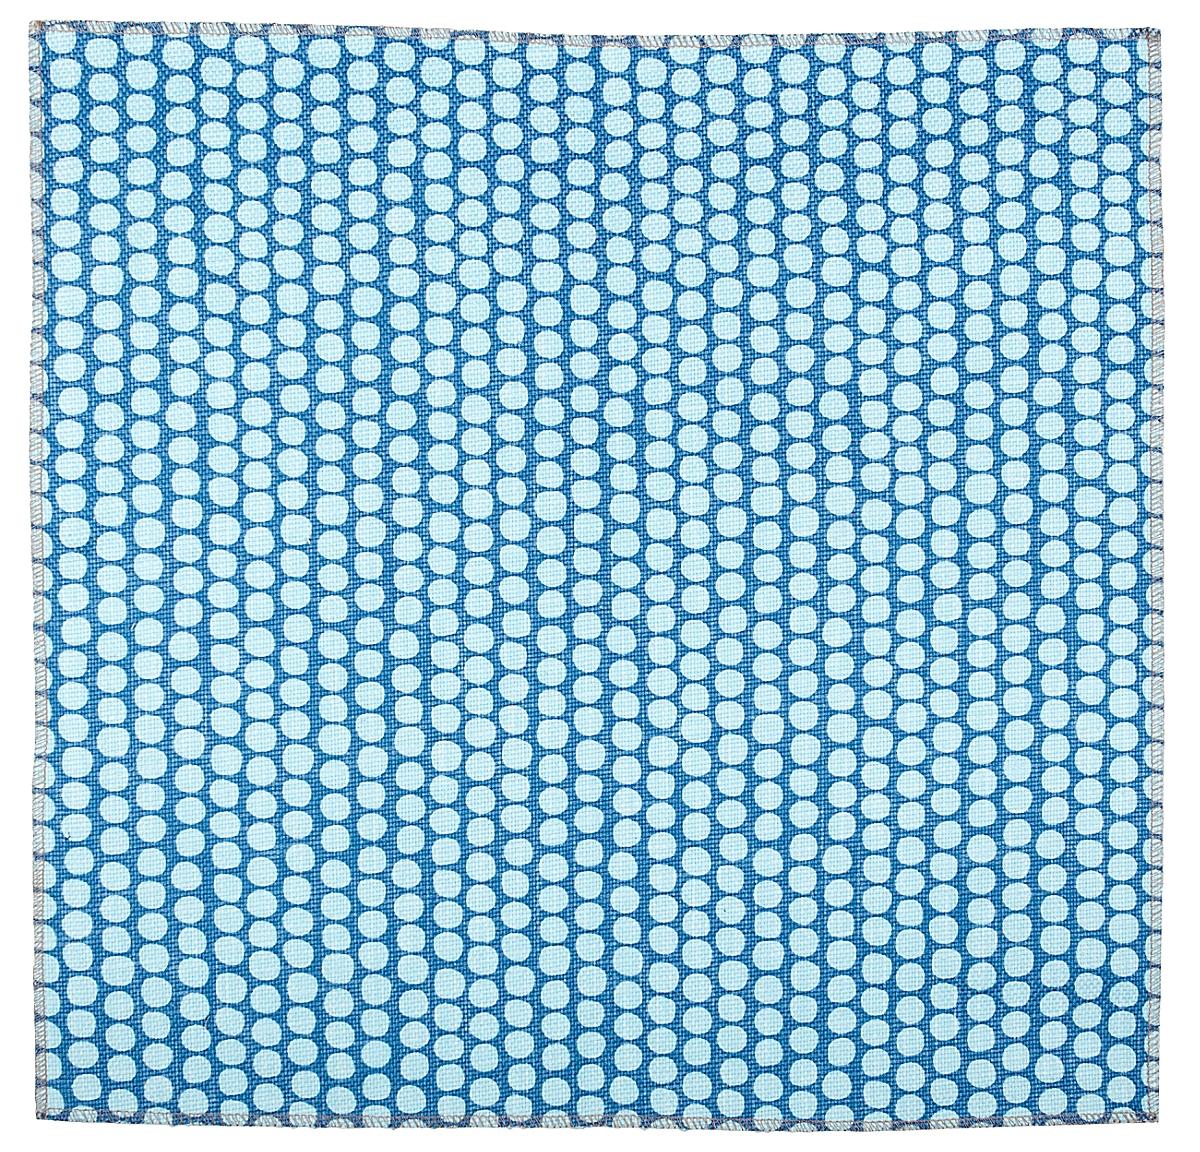 Hotty Dotty: China Blue (fabric yardage)